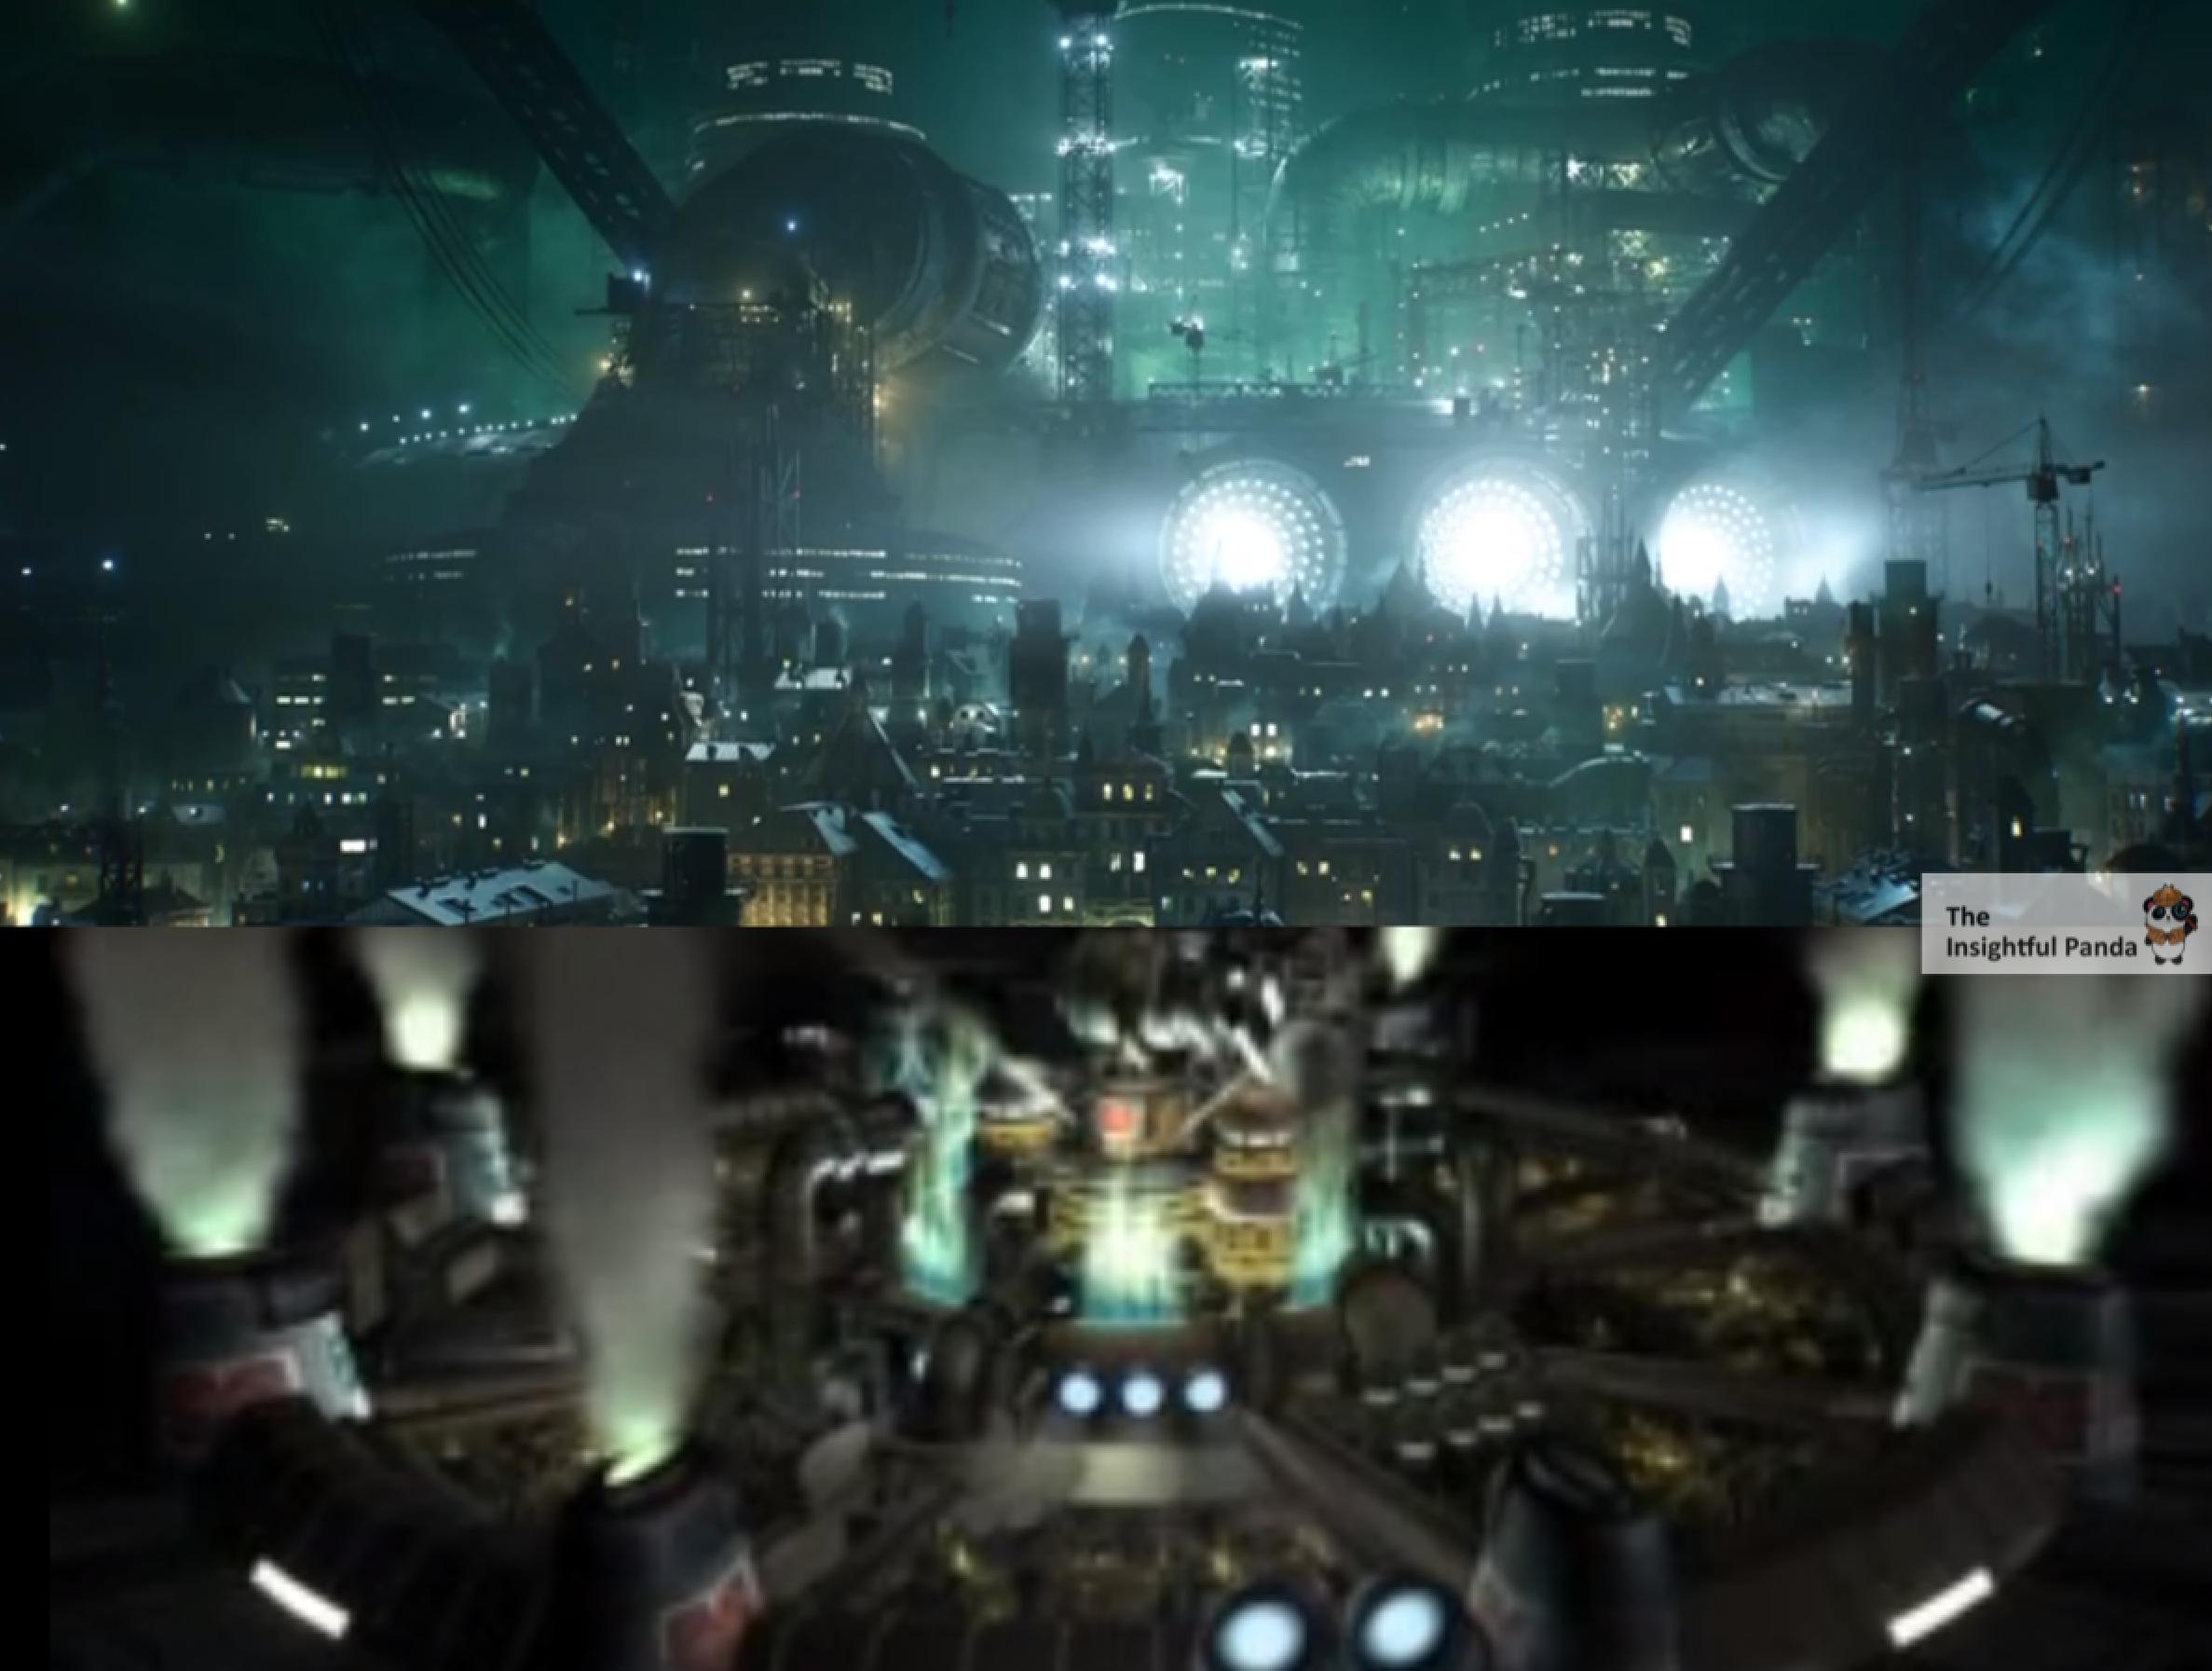 final fantasy vii remake comparison essay